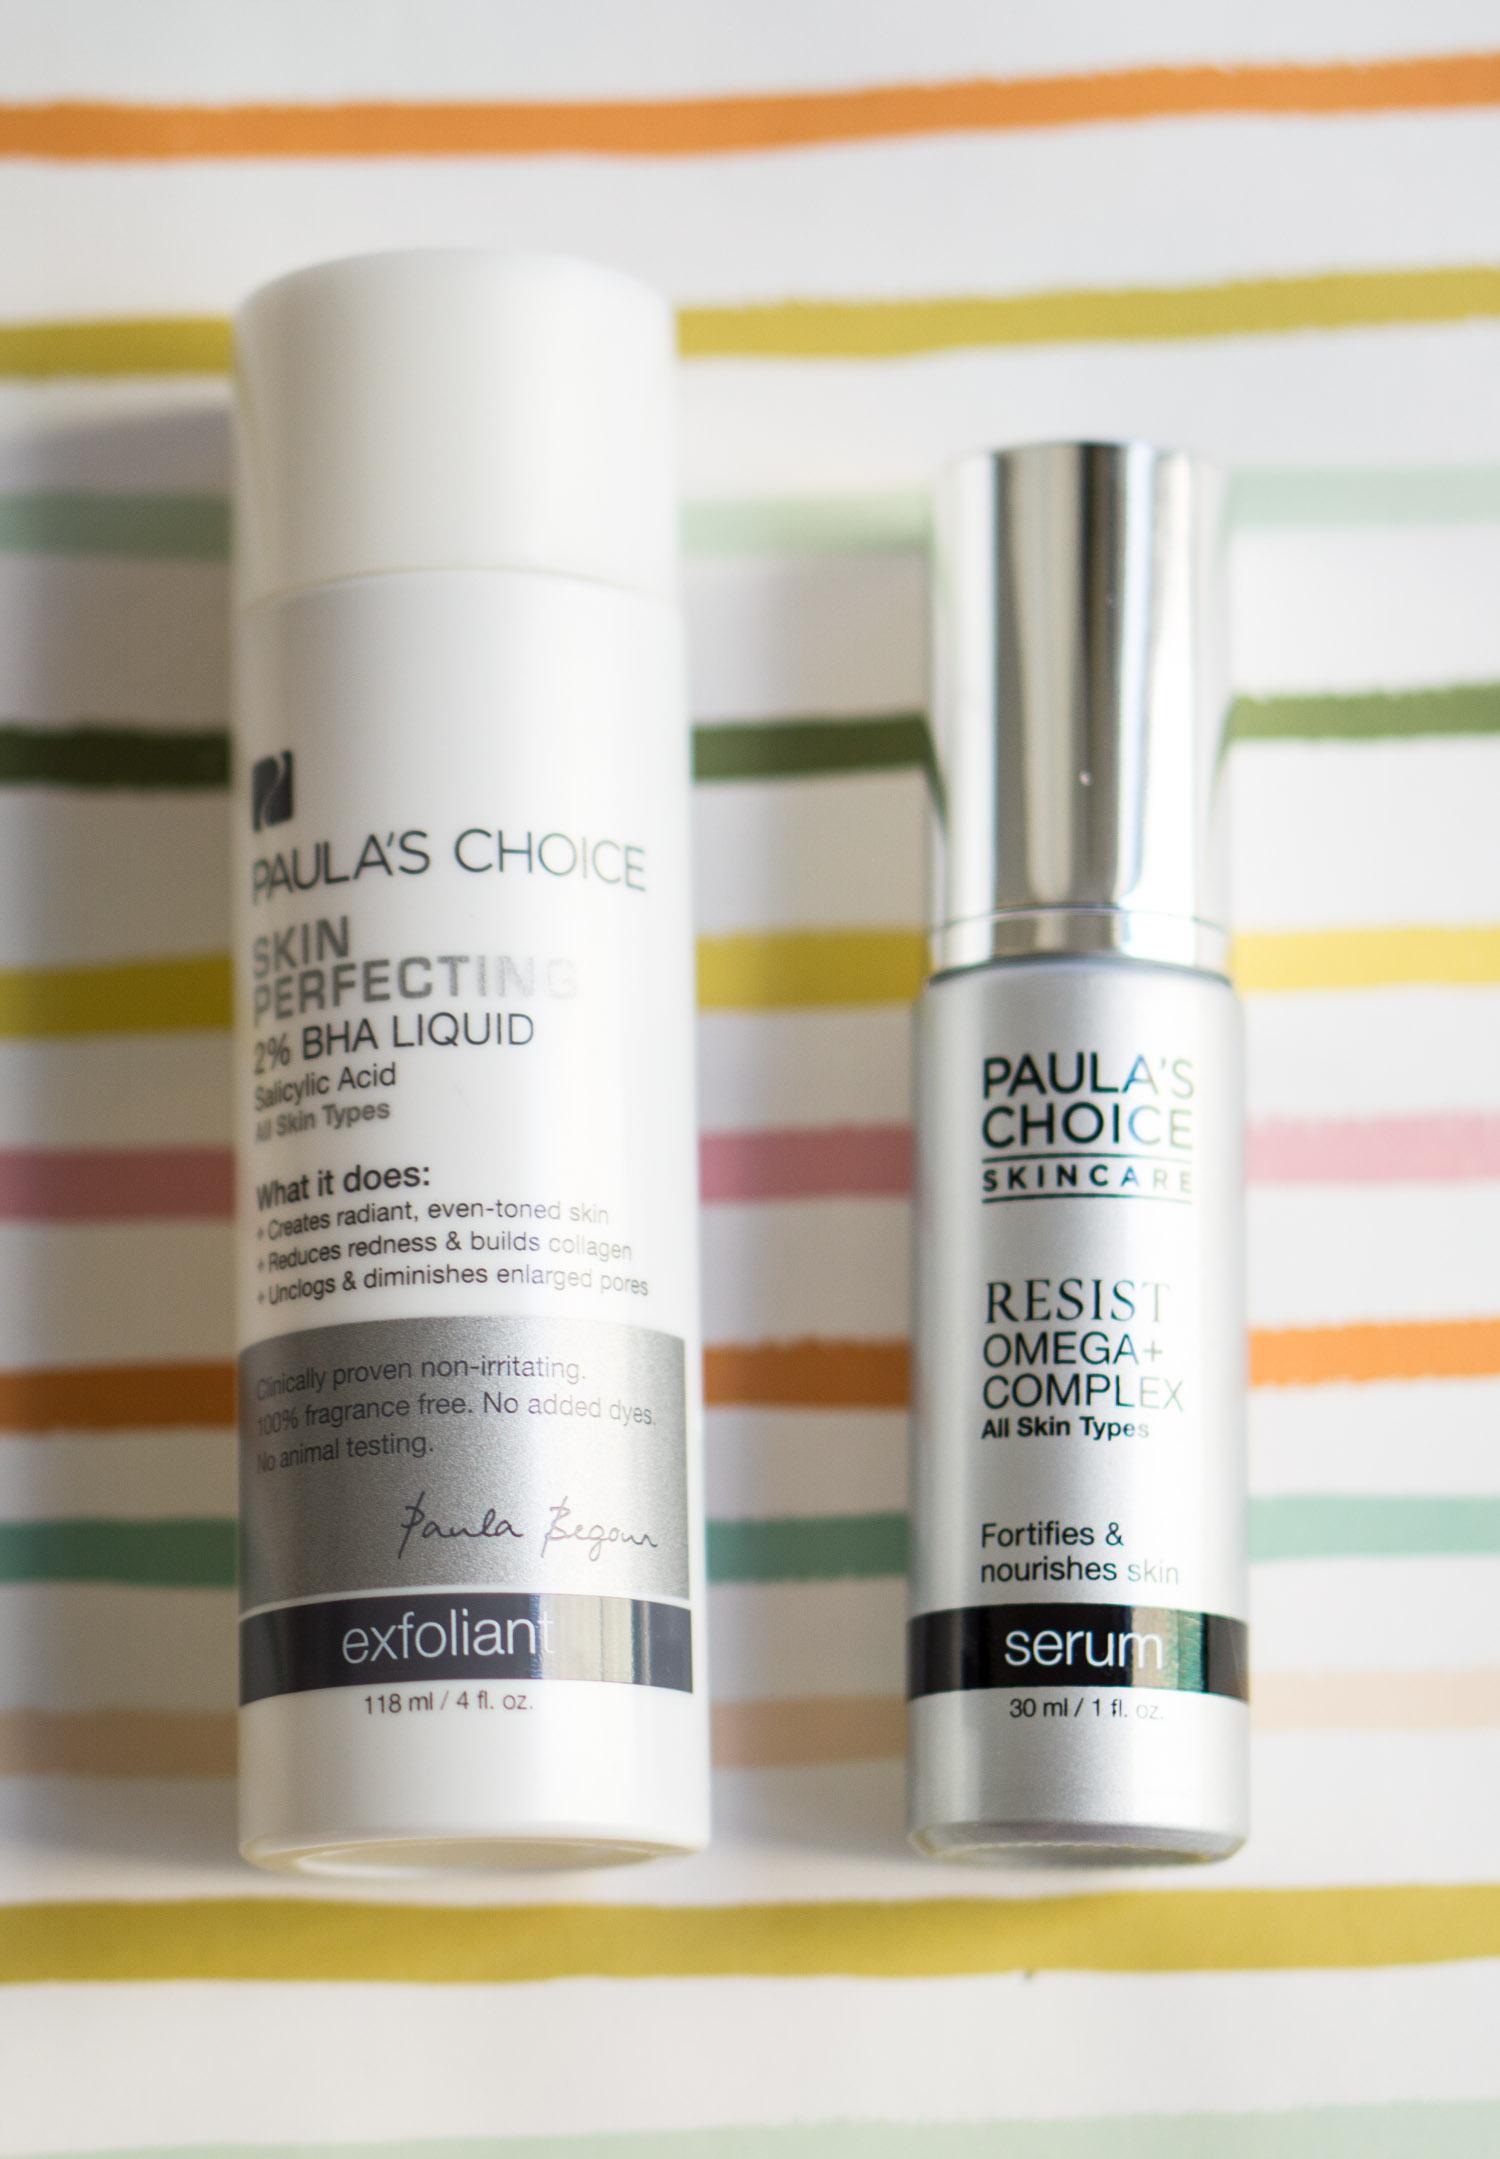 Paula's Choice Skin Perfecting 2% BHA Liquid review